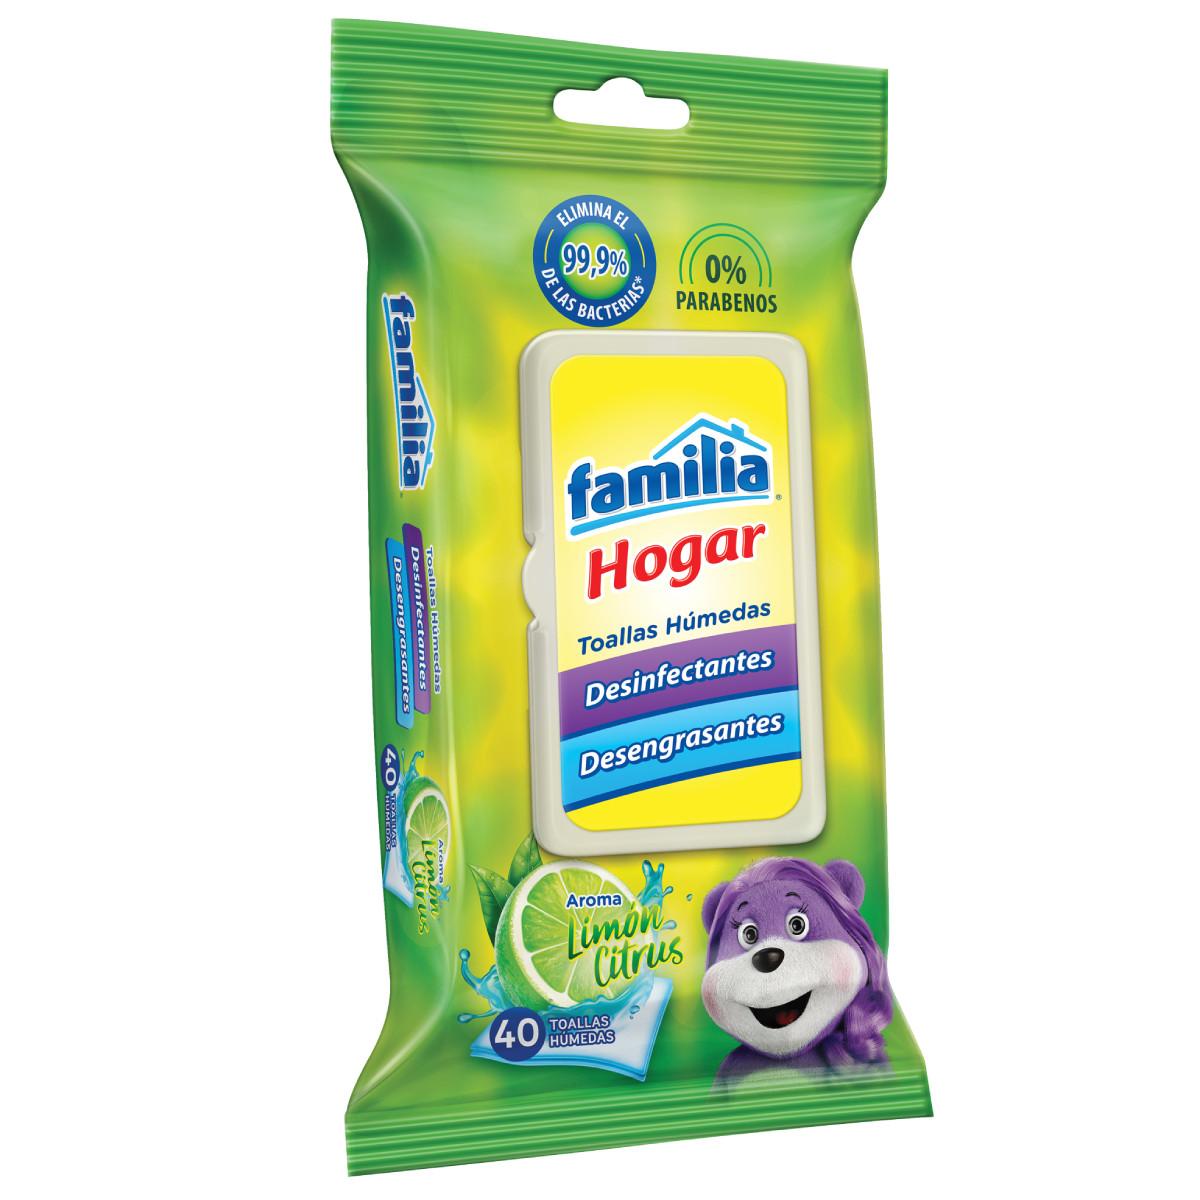 Imagen Toallas Húmedas Desinfectante Familia Hogar X 40 und